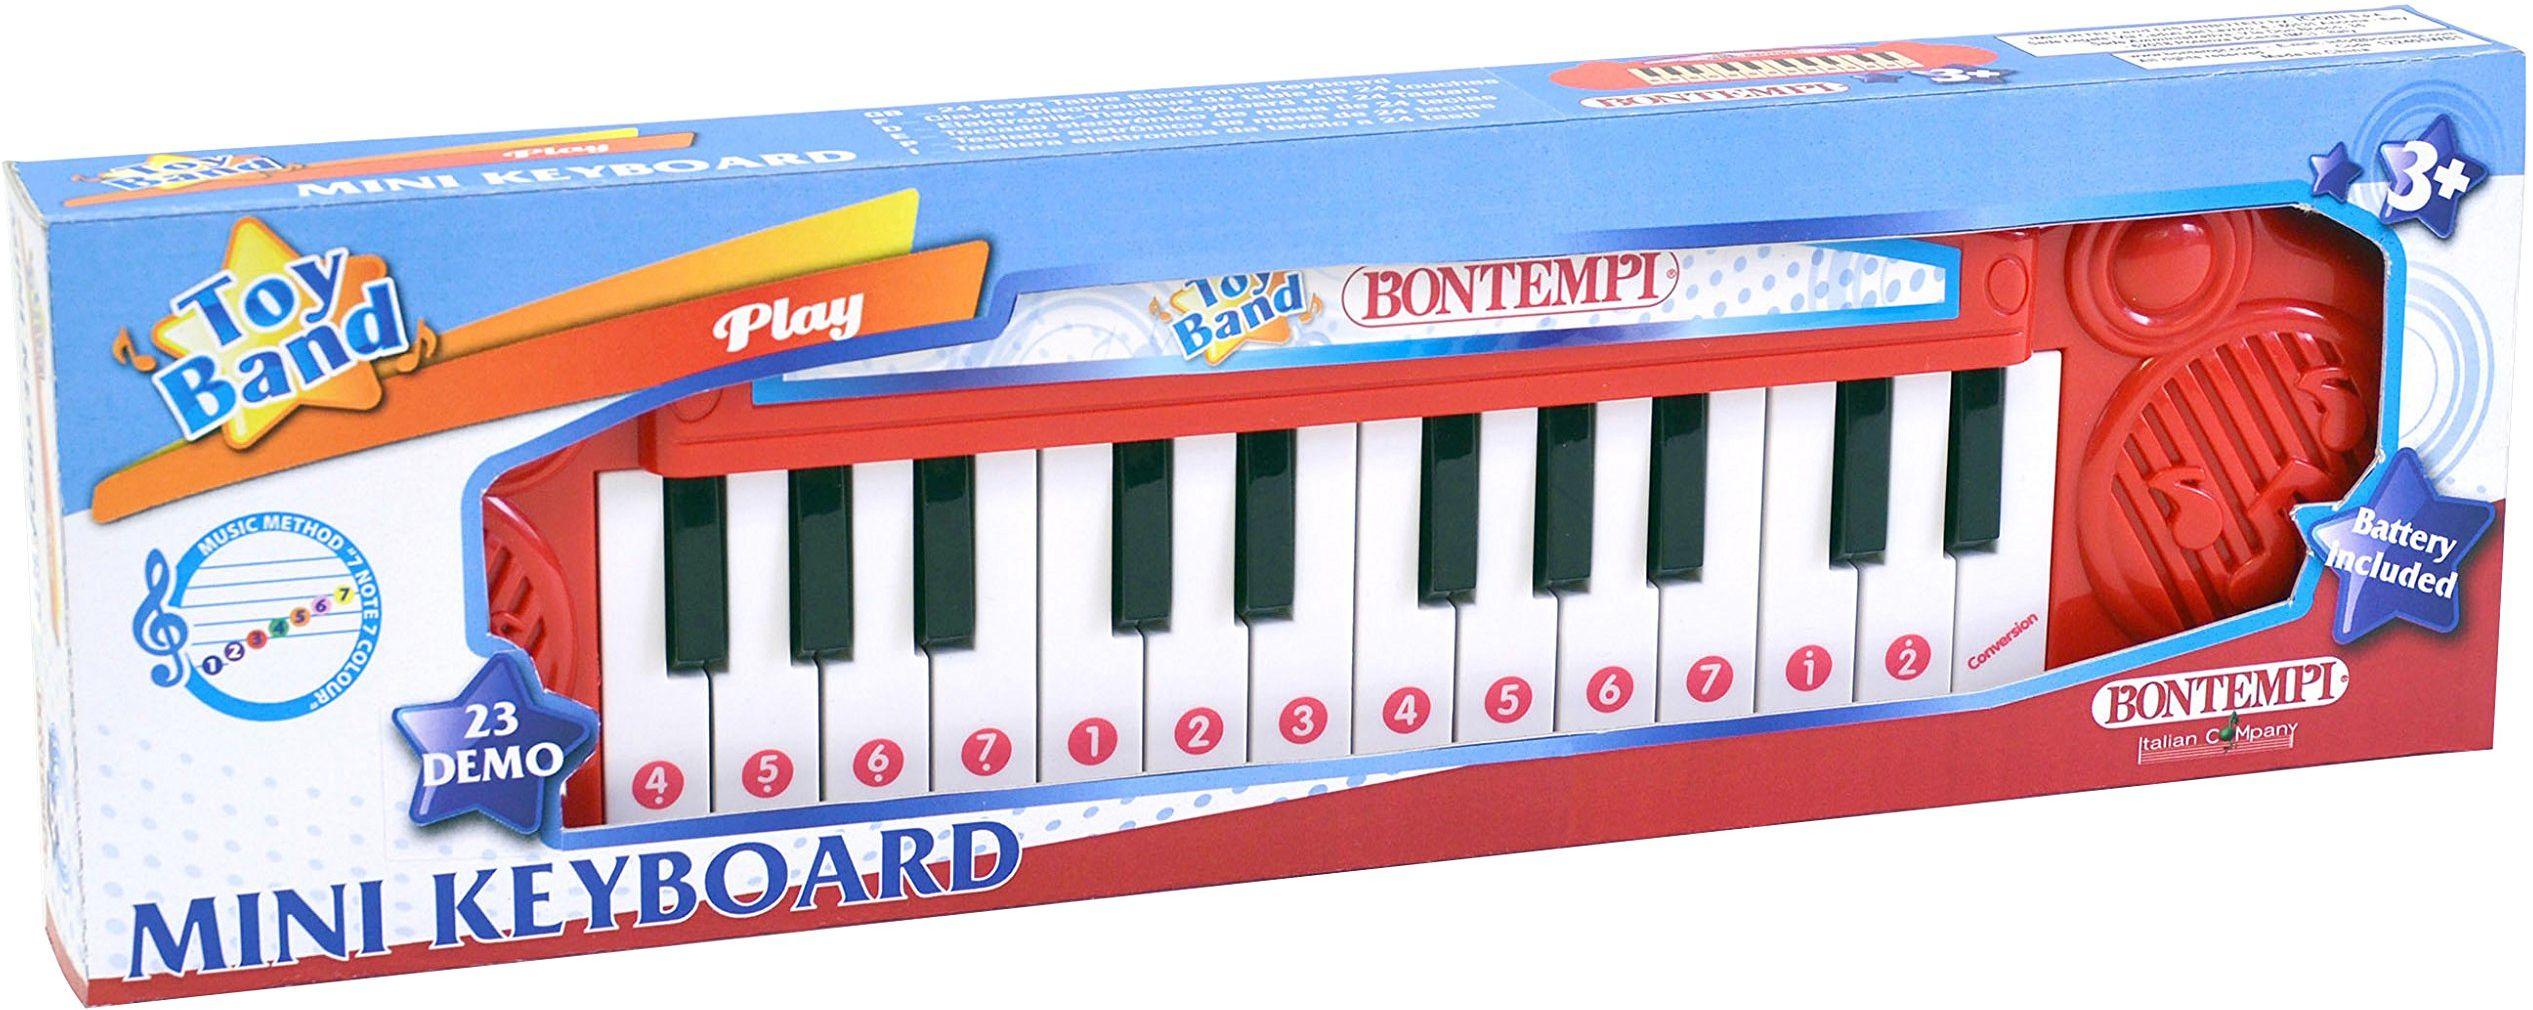 Bontempi Bontempi122406 24 klawisze pudełko na klawiaturę, wielokolorowe